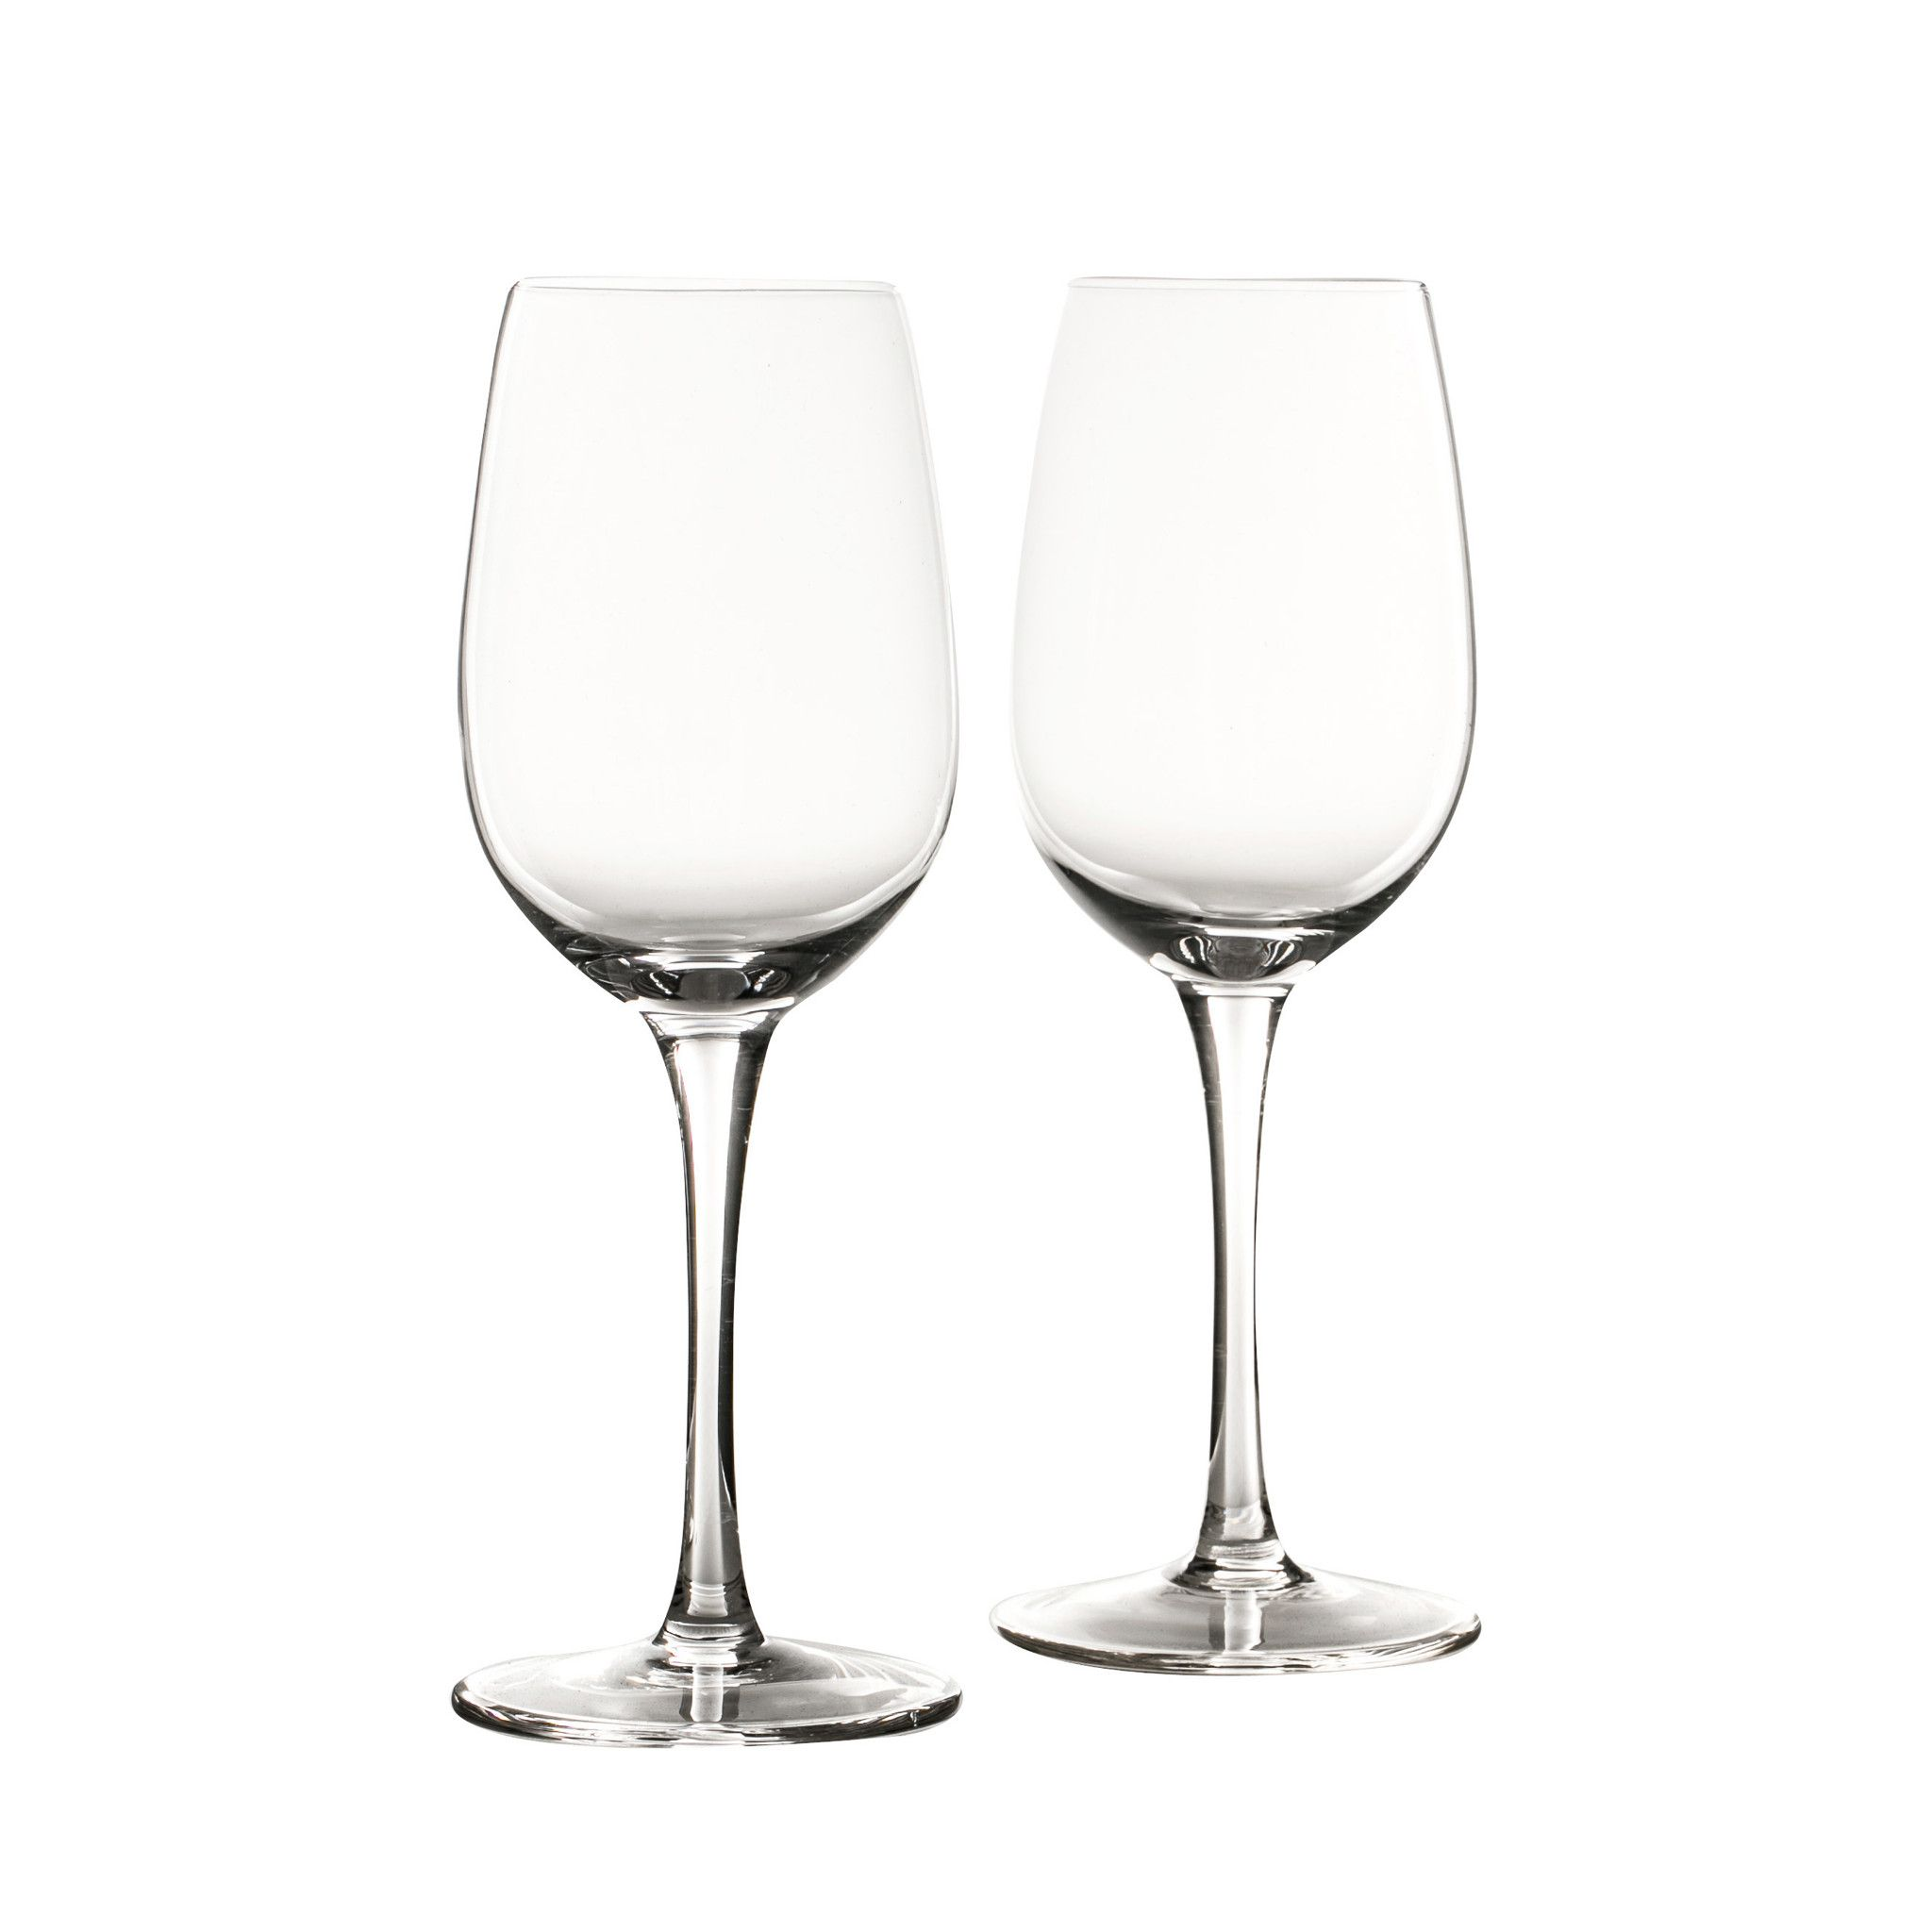 Vienna 12-ounce Wine Glass Set, 4-pack